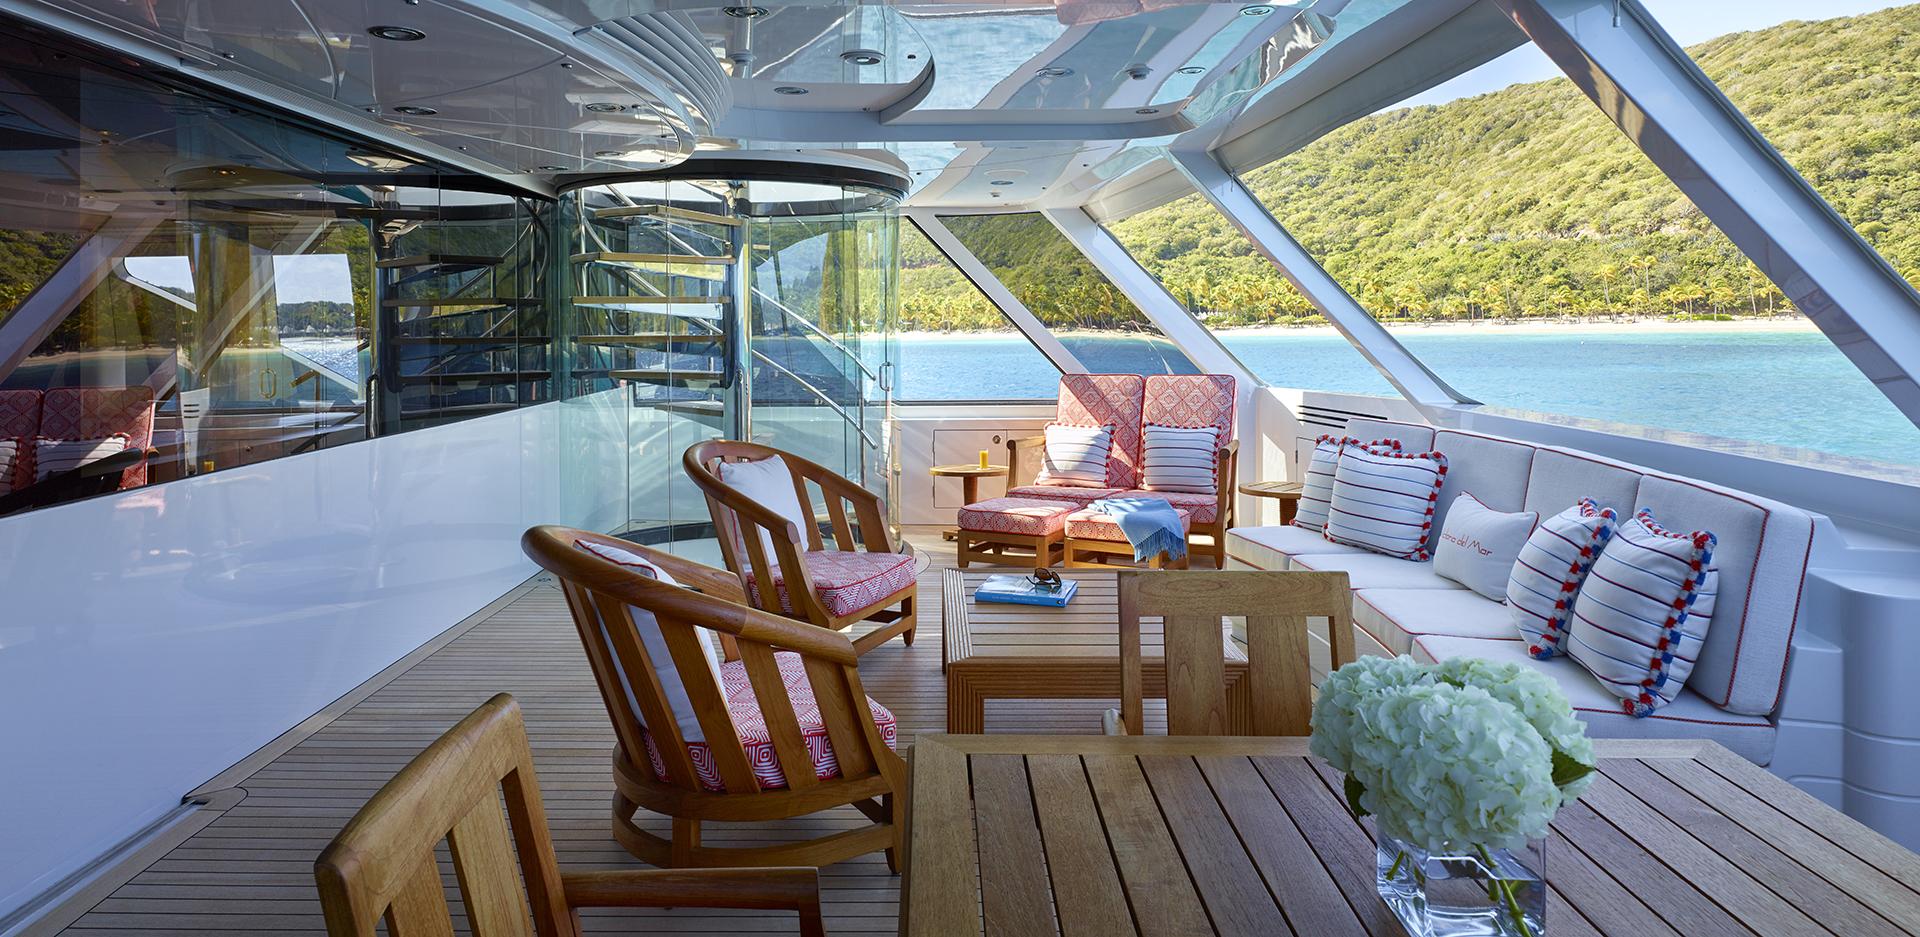 Owner Deck Exterior Area